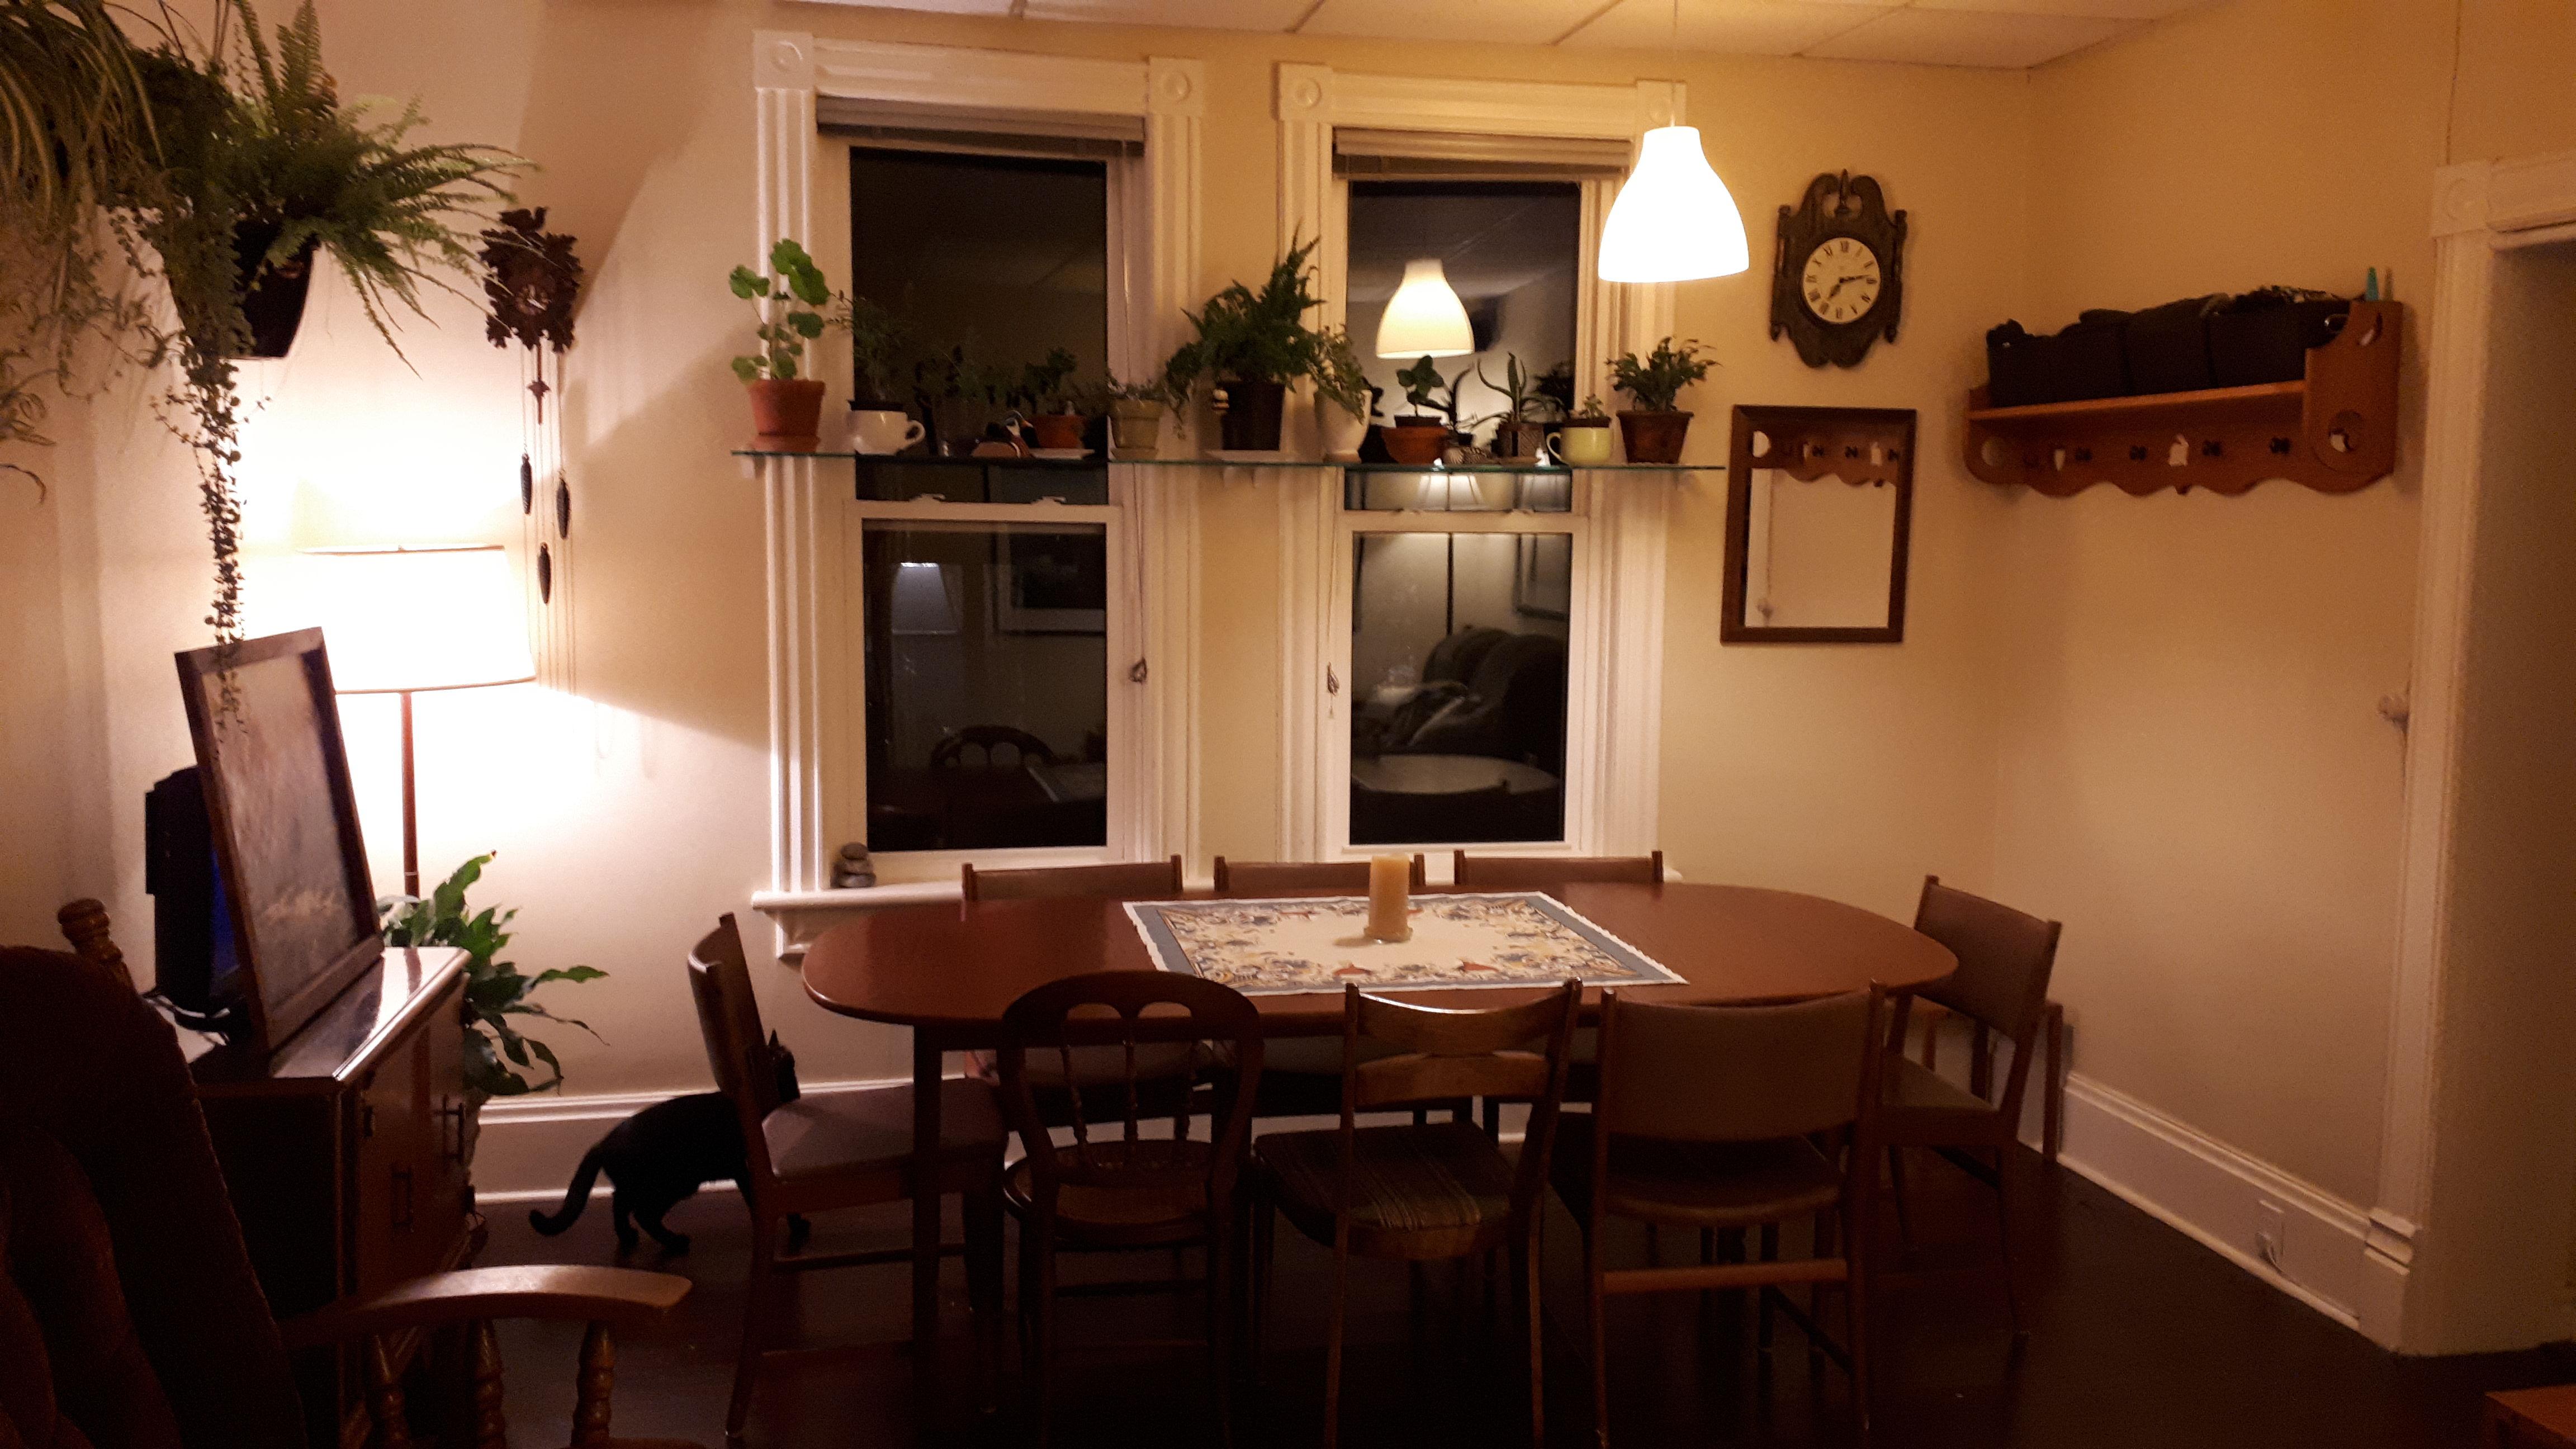 Living Room At Night   KW Professional Organizers   Wabi Sabi